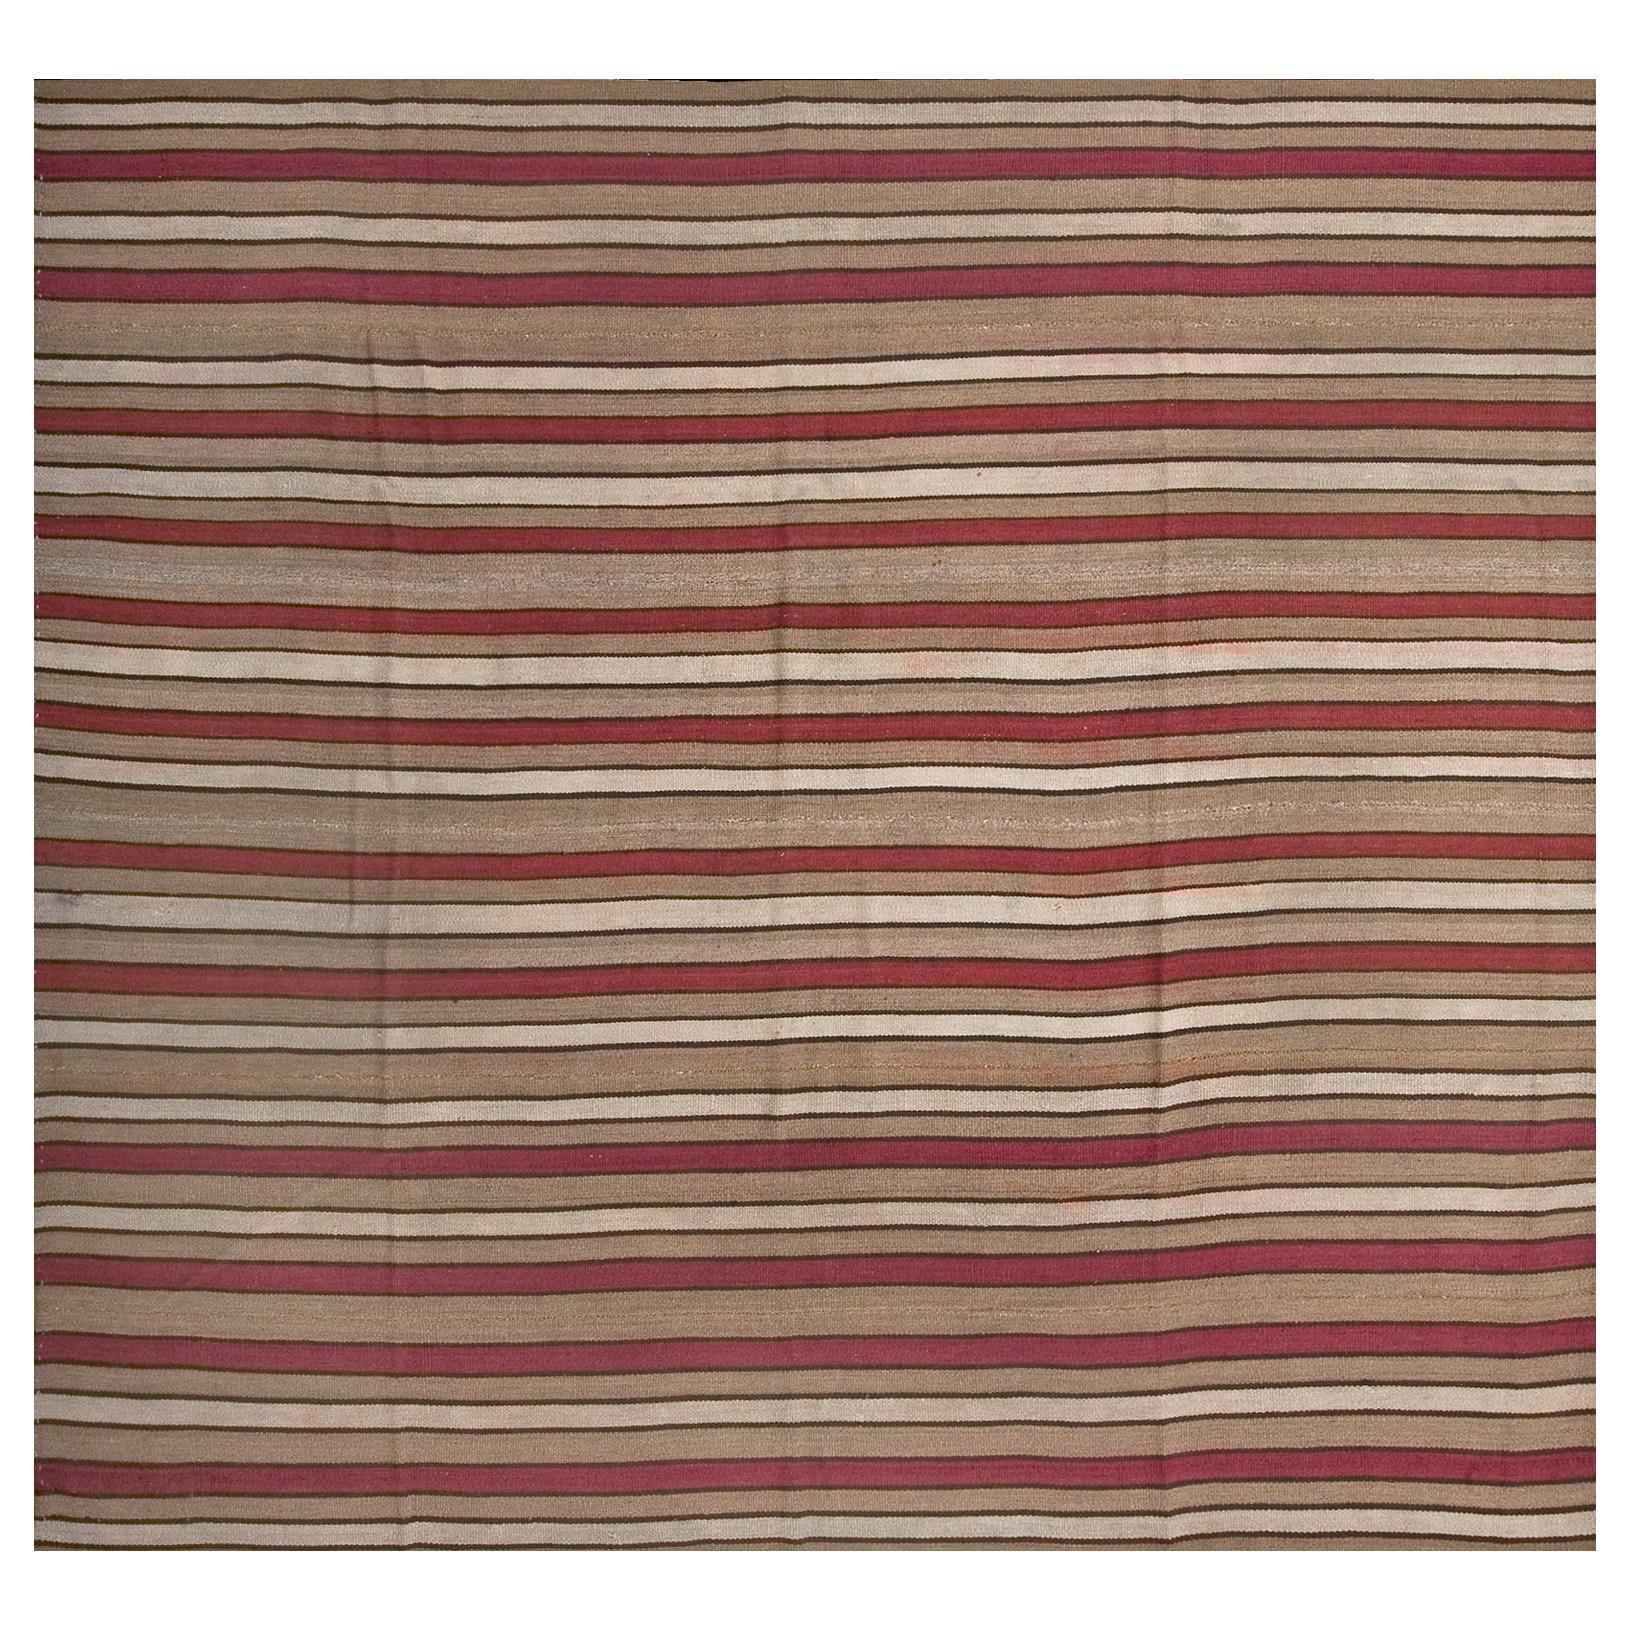 Antique Persian Tribal Kilim Rug